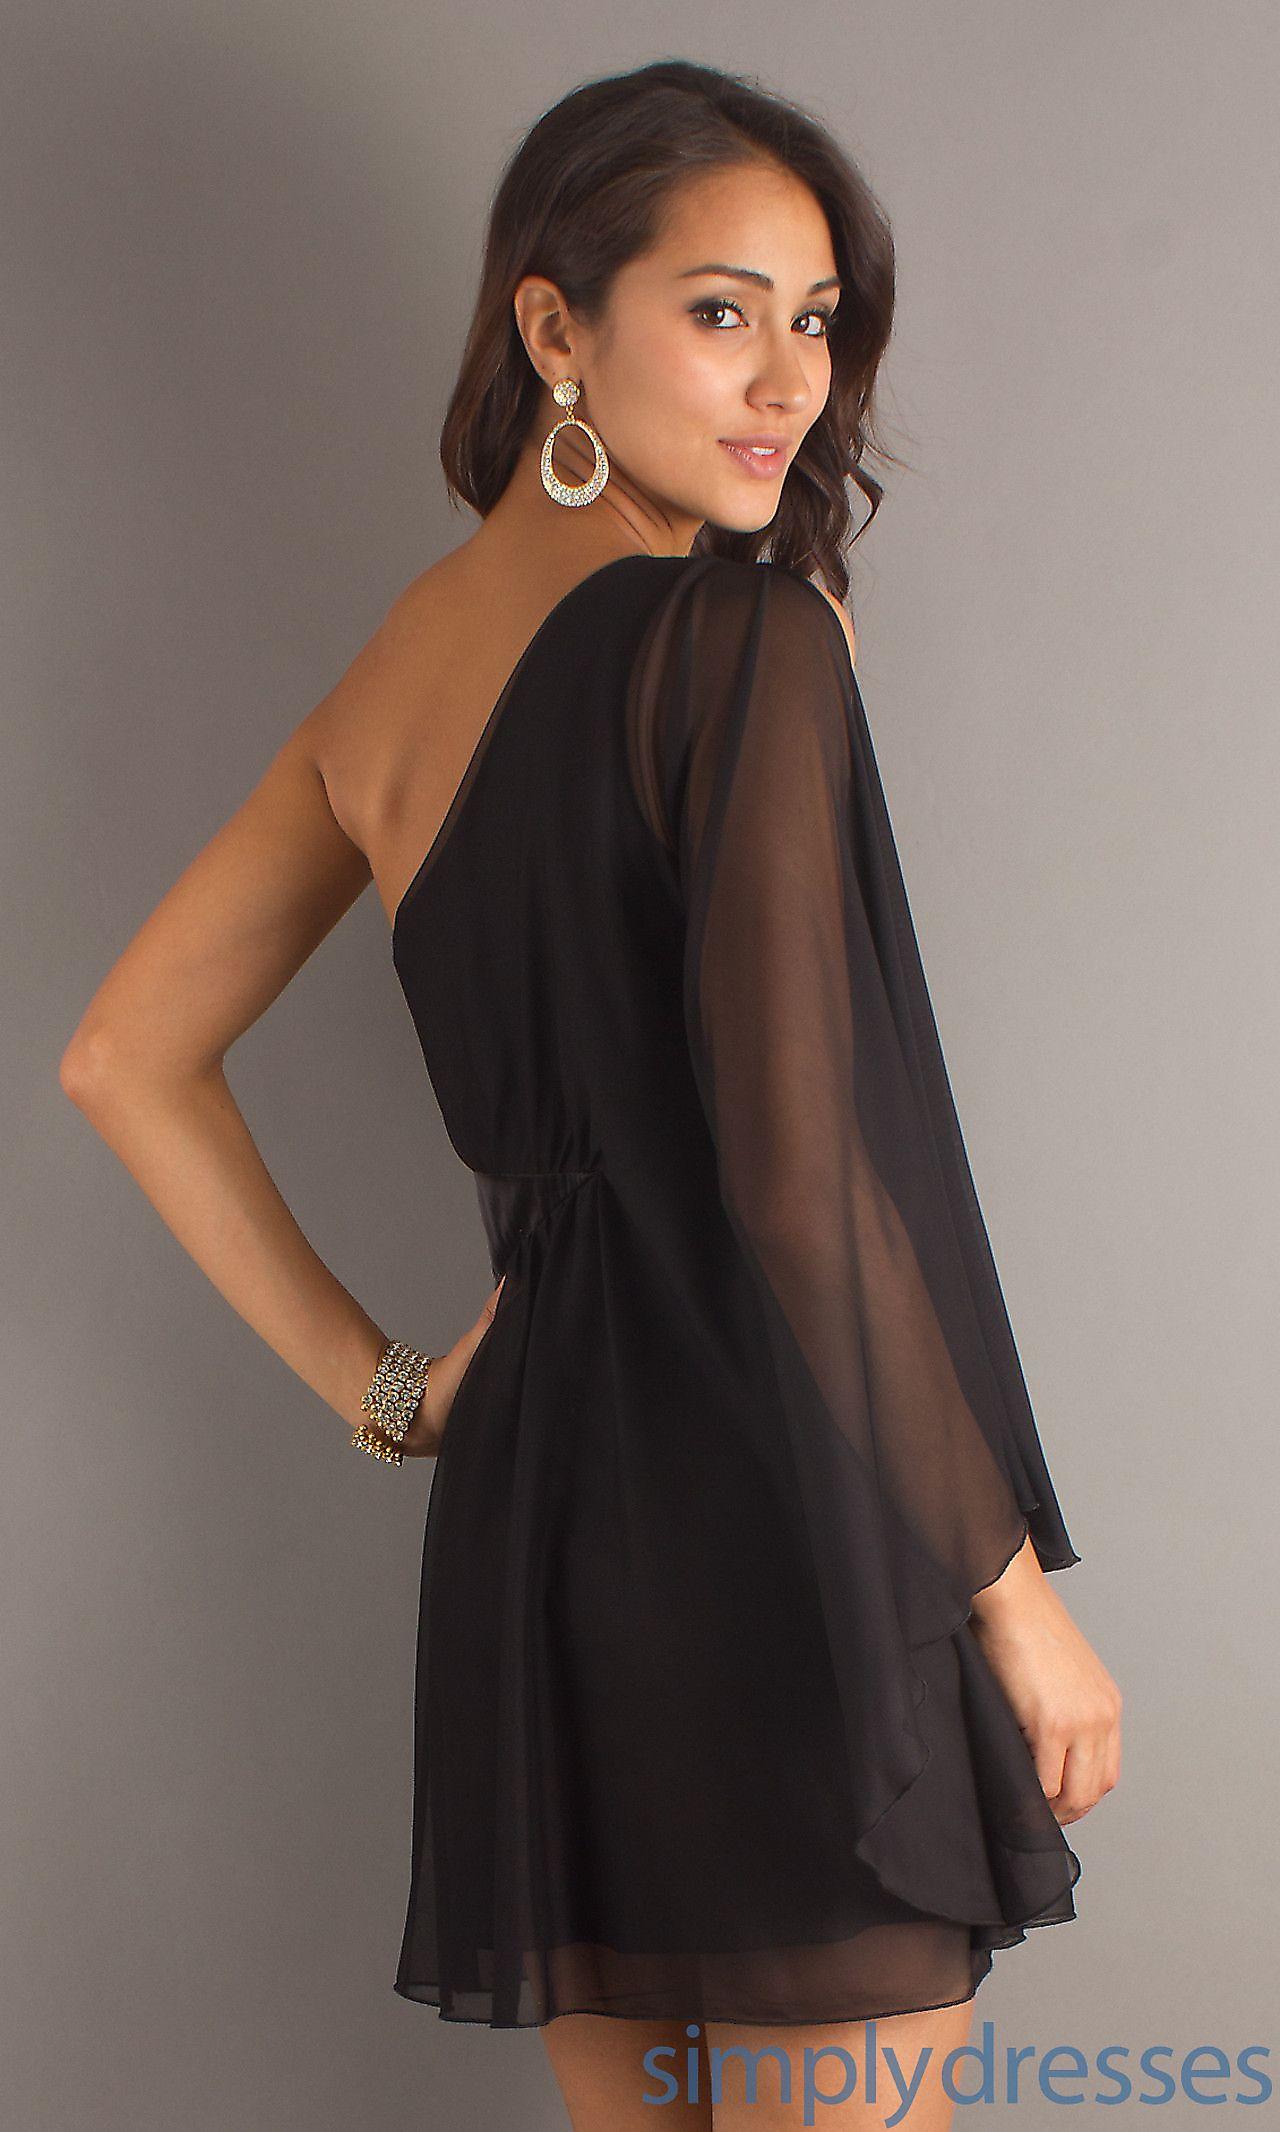 Short Black Dress With One Long Sheer Sleeve Party Dress Long Sleeve Long Sleeve Prom Dress Short Black Homecoming Dress [ 2132 x 1280 Pixel ]